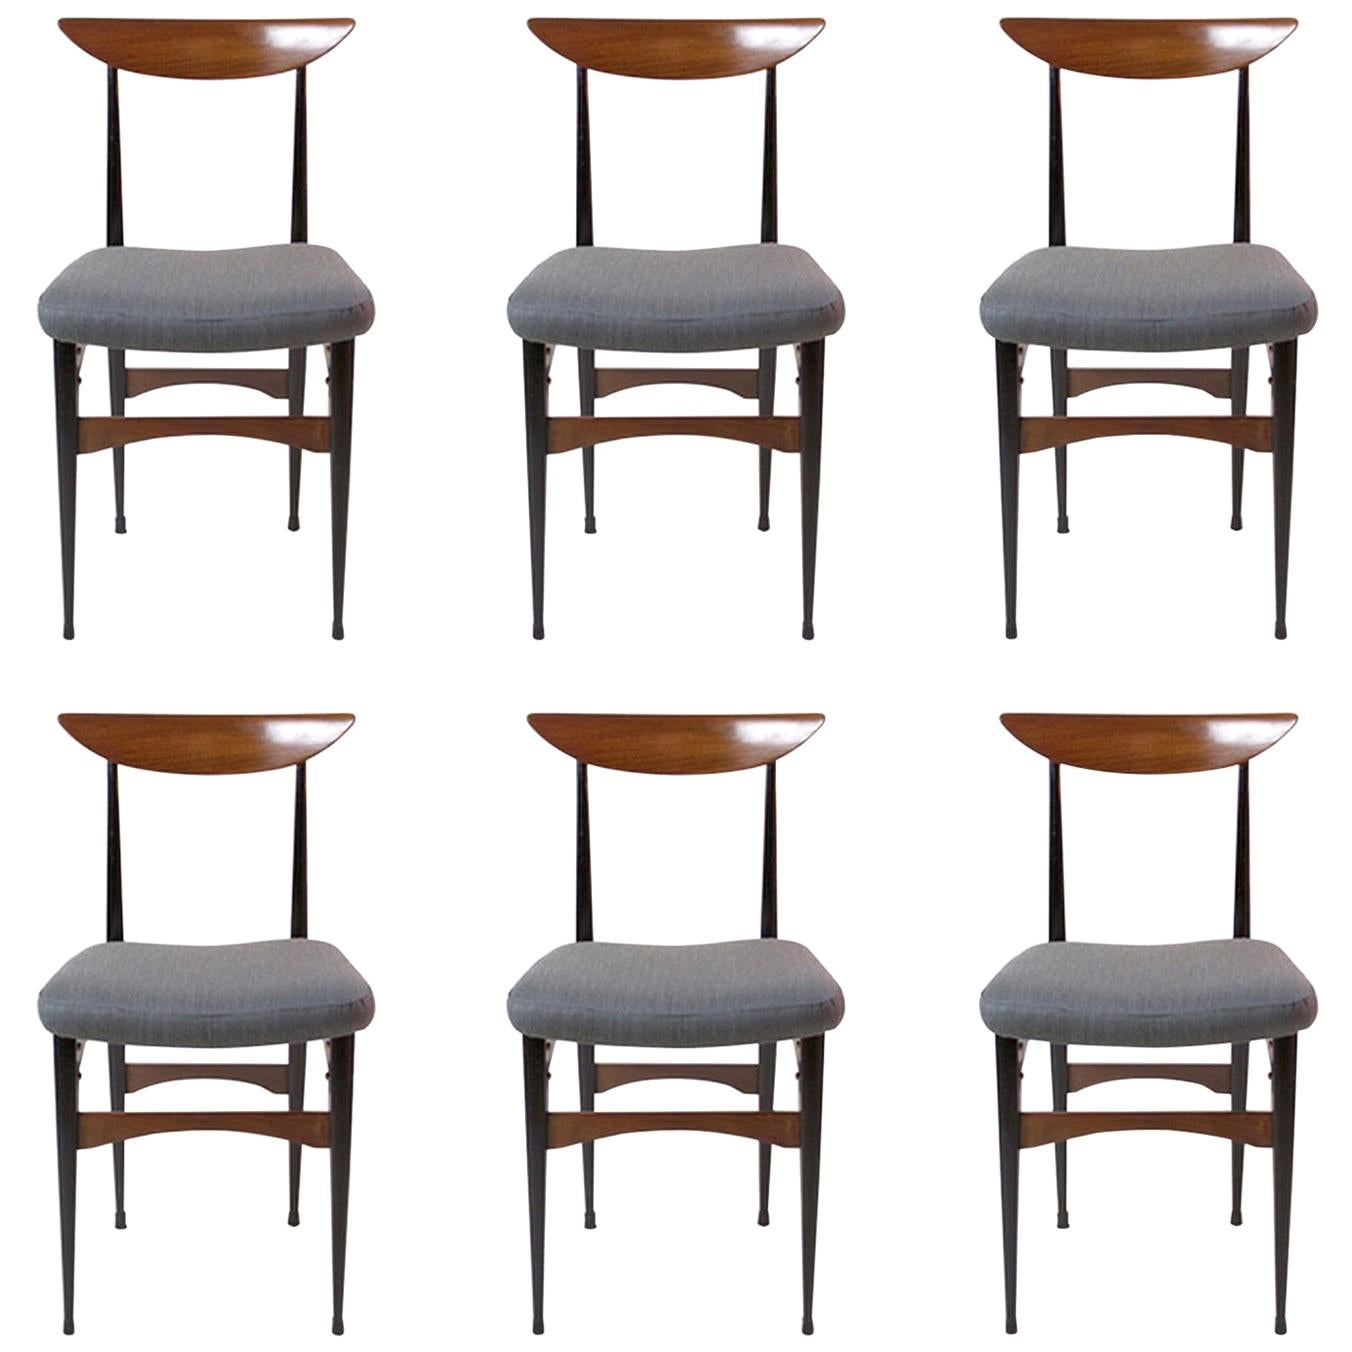 Six Mid-Century Italian Dining Chairs